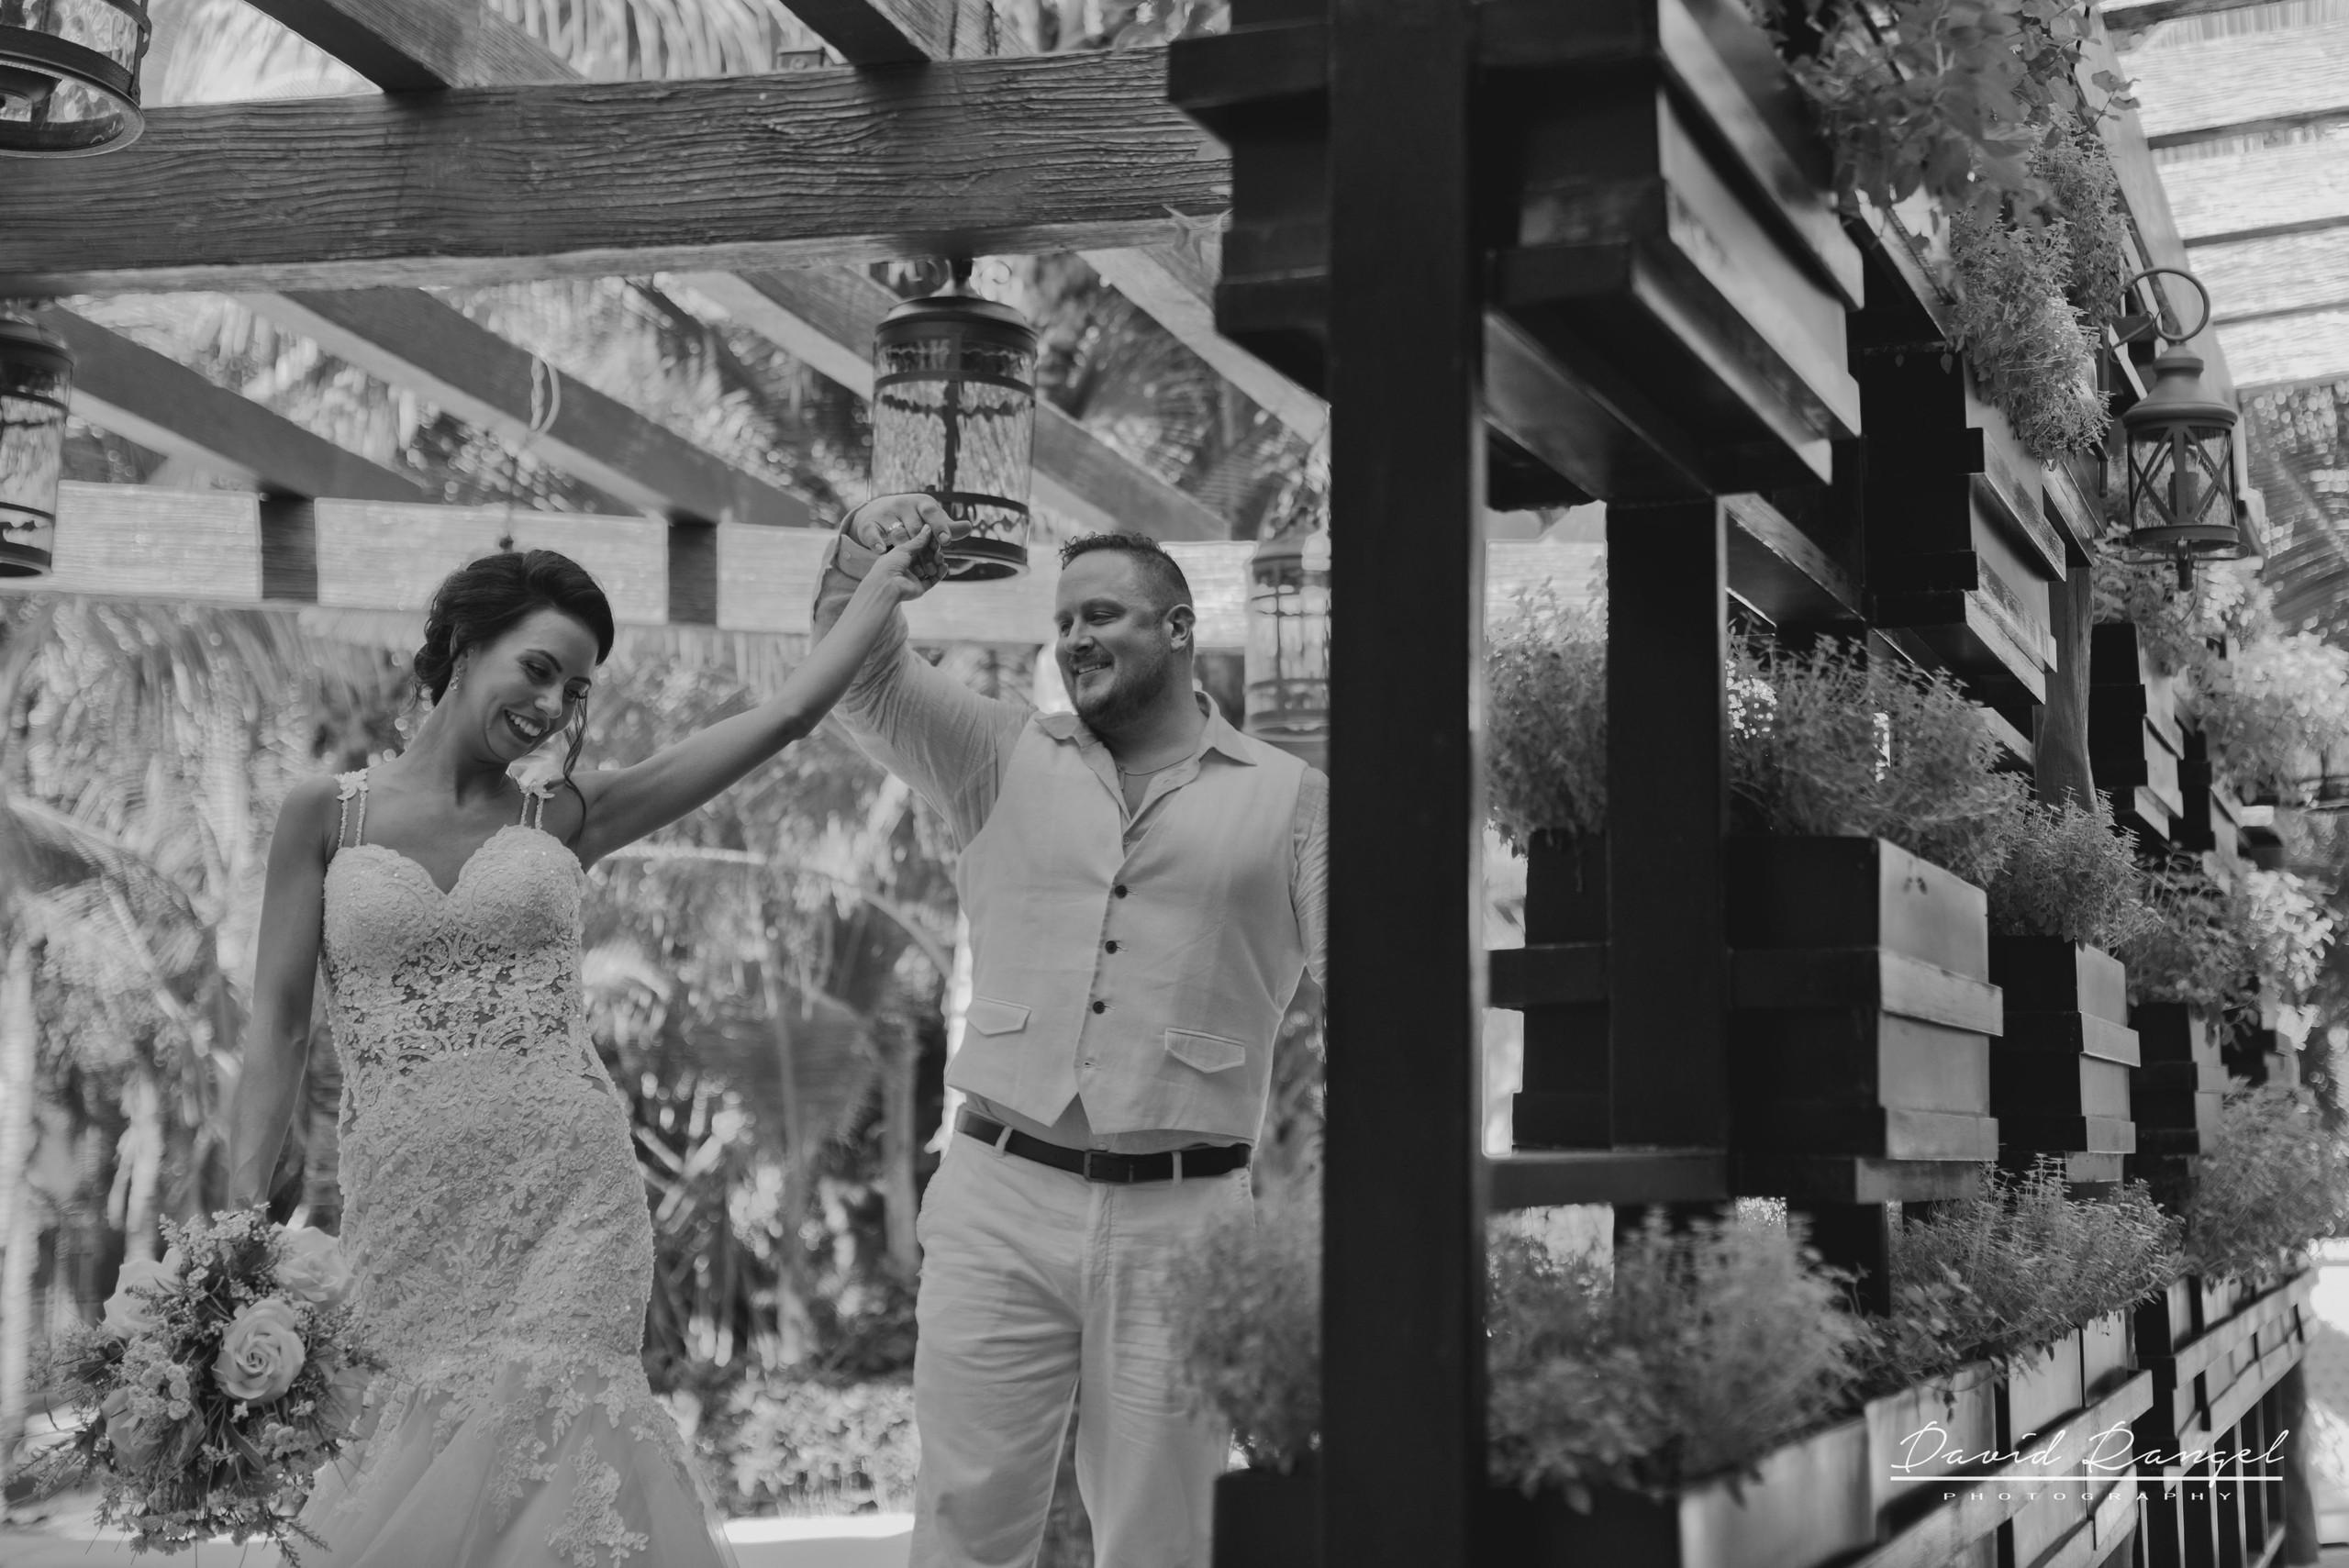 firstlook+bride+groom+to+be+frame+spin